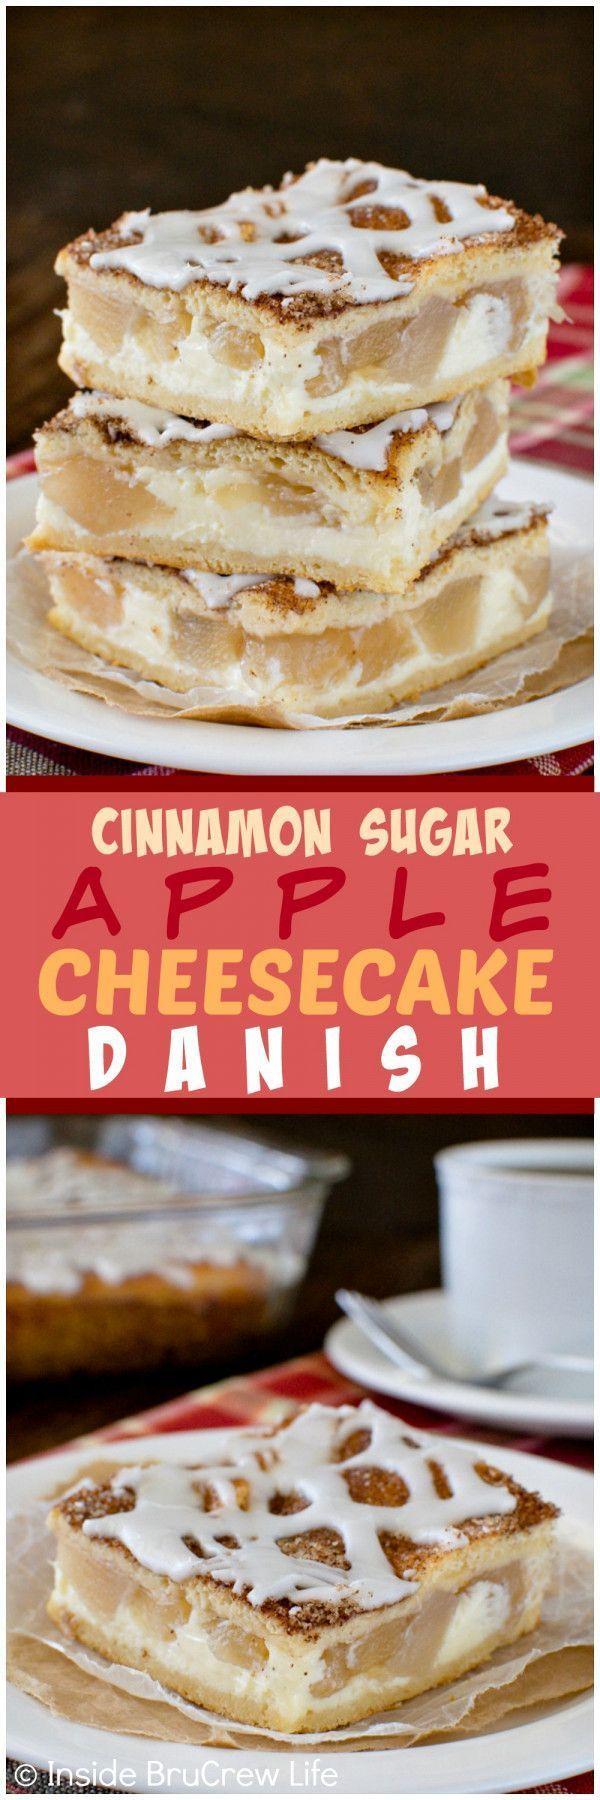 Cinnamon Sugar Apple Cheesecake Danish - the sugar coating gives a sweet crunch to the creamy cheesecake & apple chunks. Great breakfast or dessert recipe!